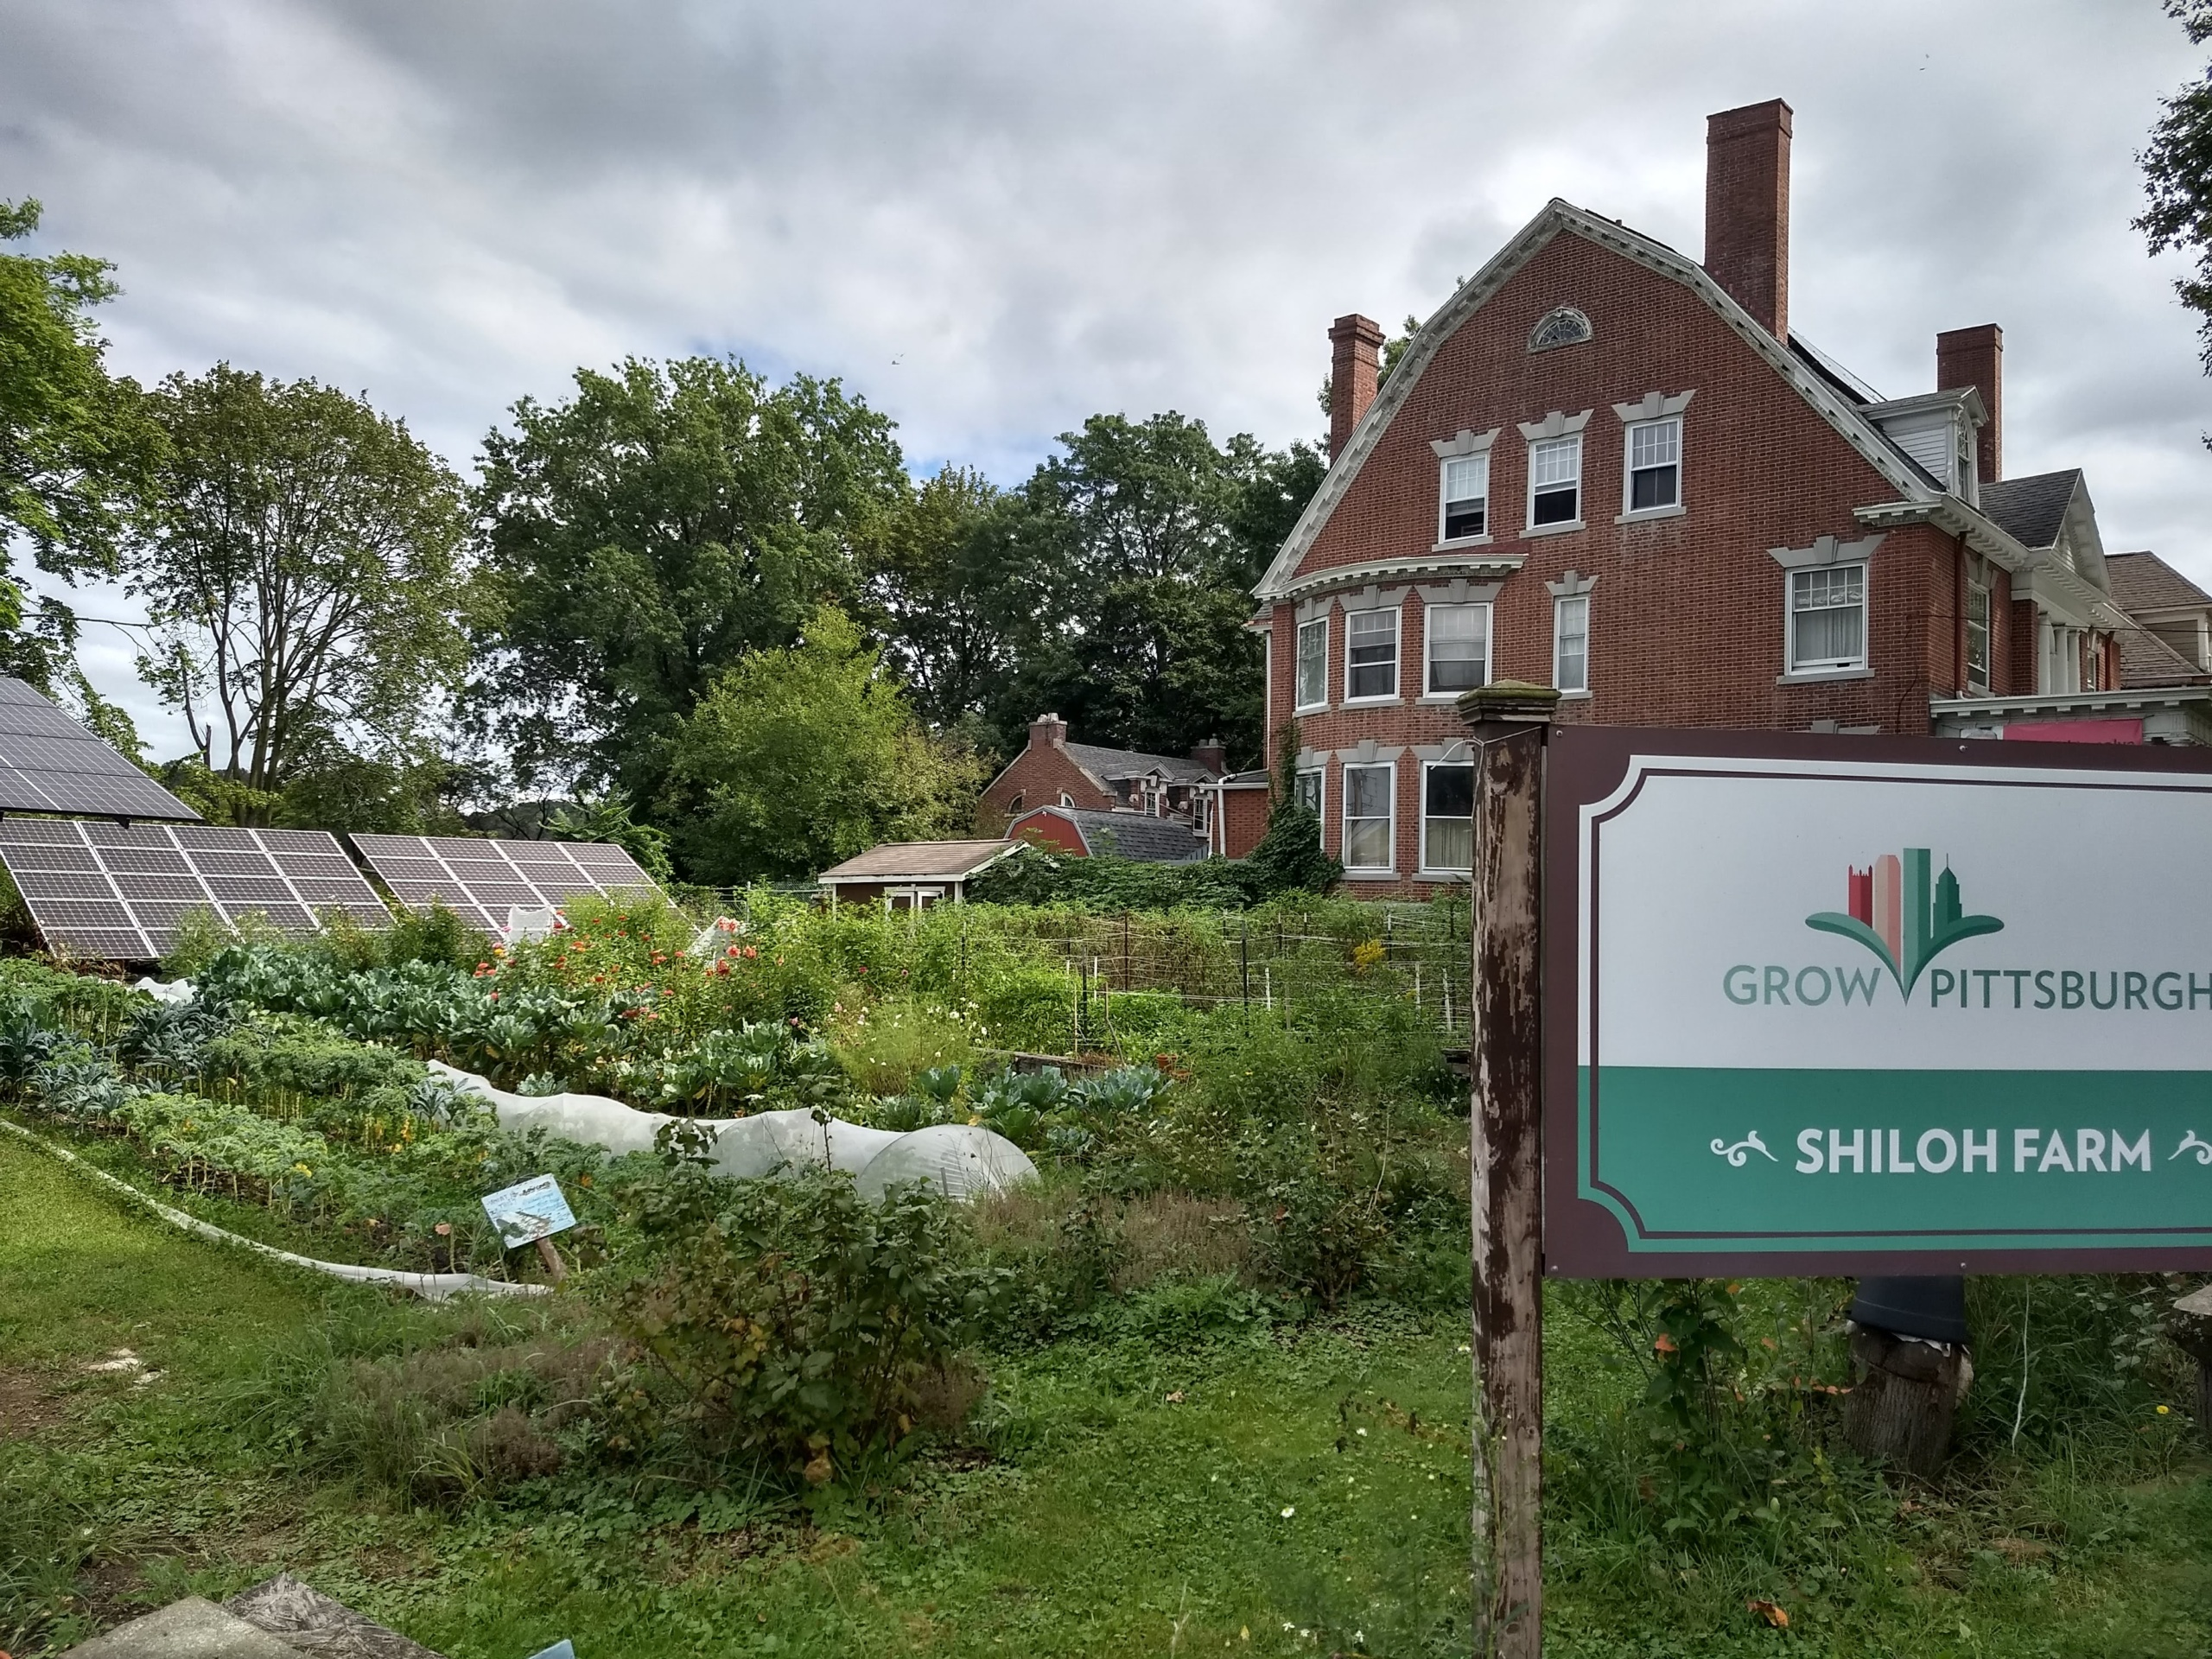 Shiloh Farm Open House